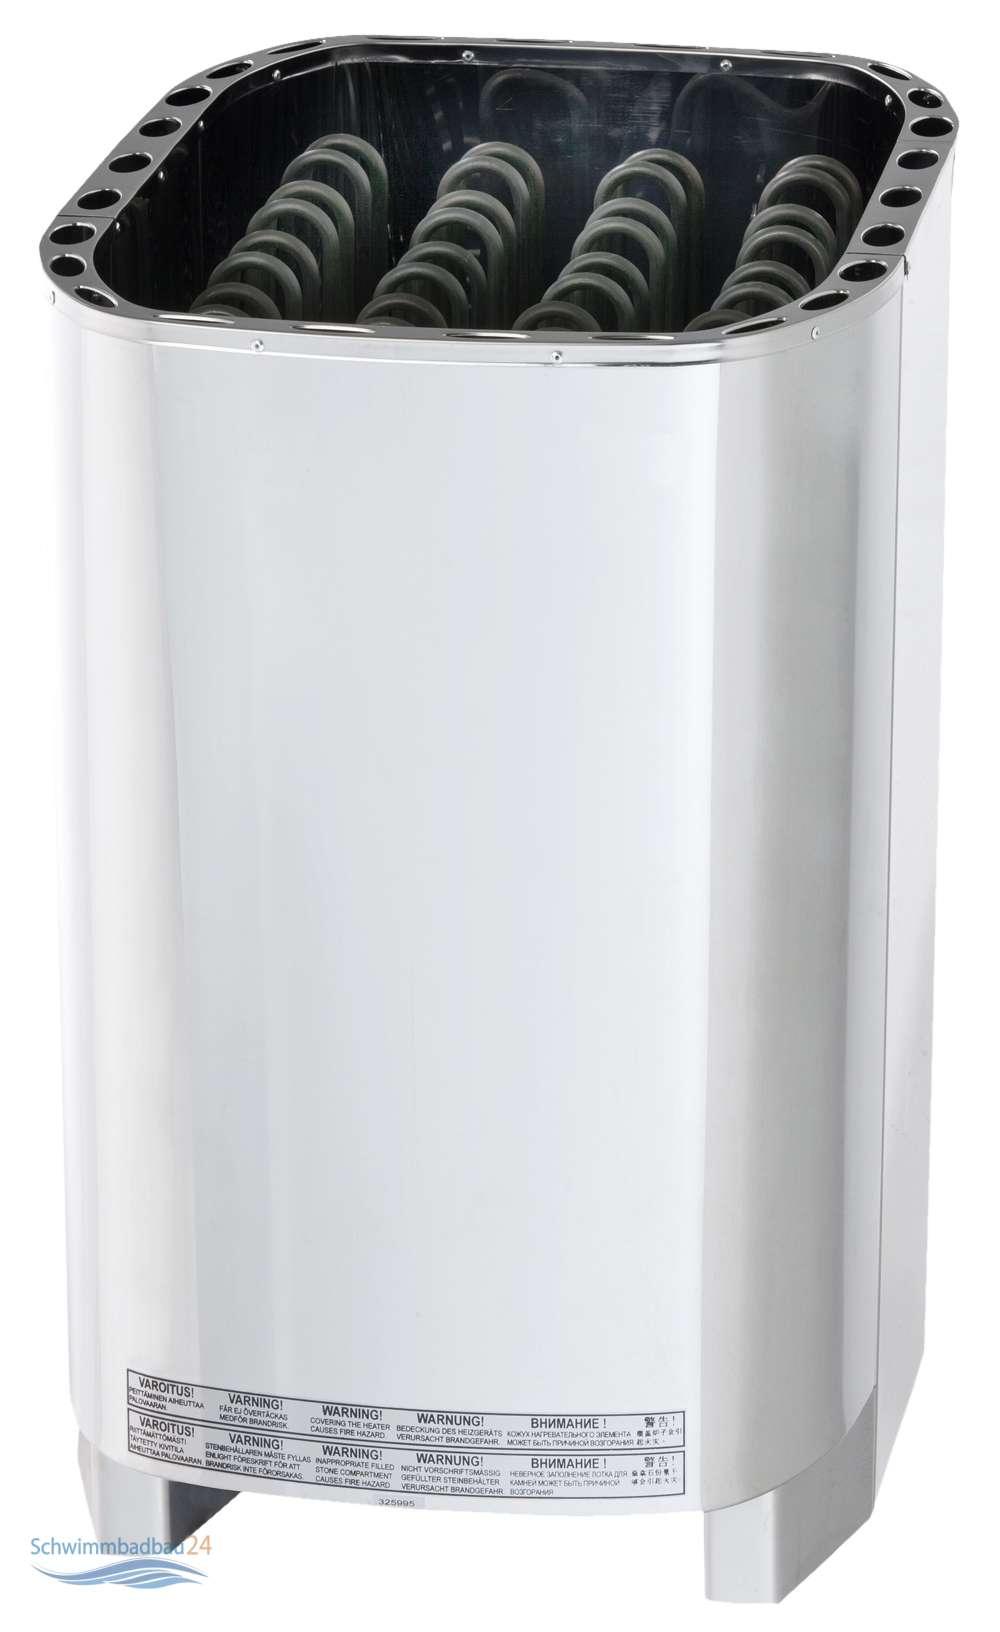 saunaofen sawotec savonia sav 90n 9 kw 639 00. Black Bedroom Furniture Sets. Home Design Ideas